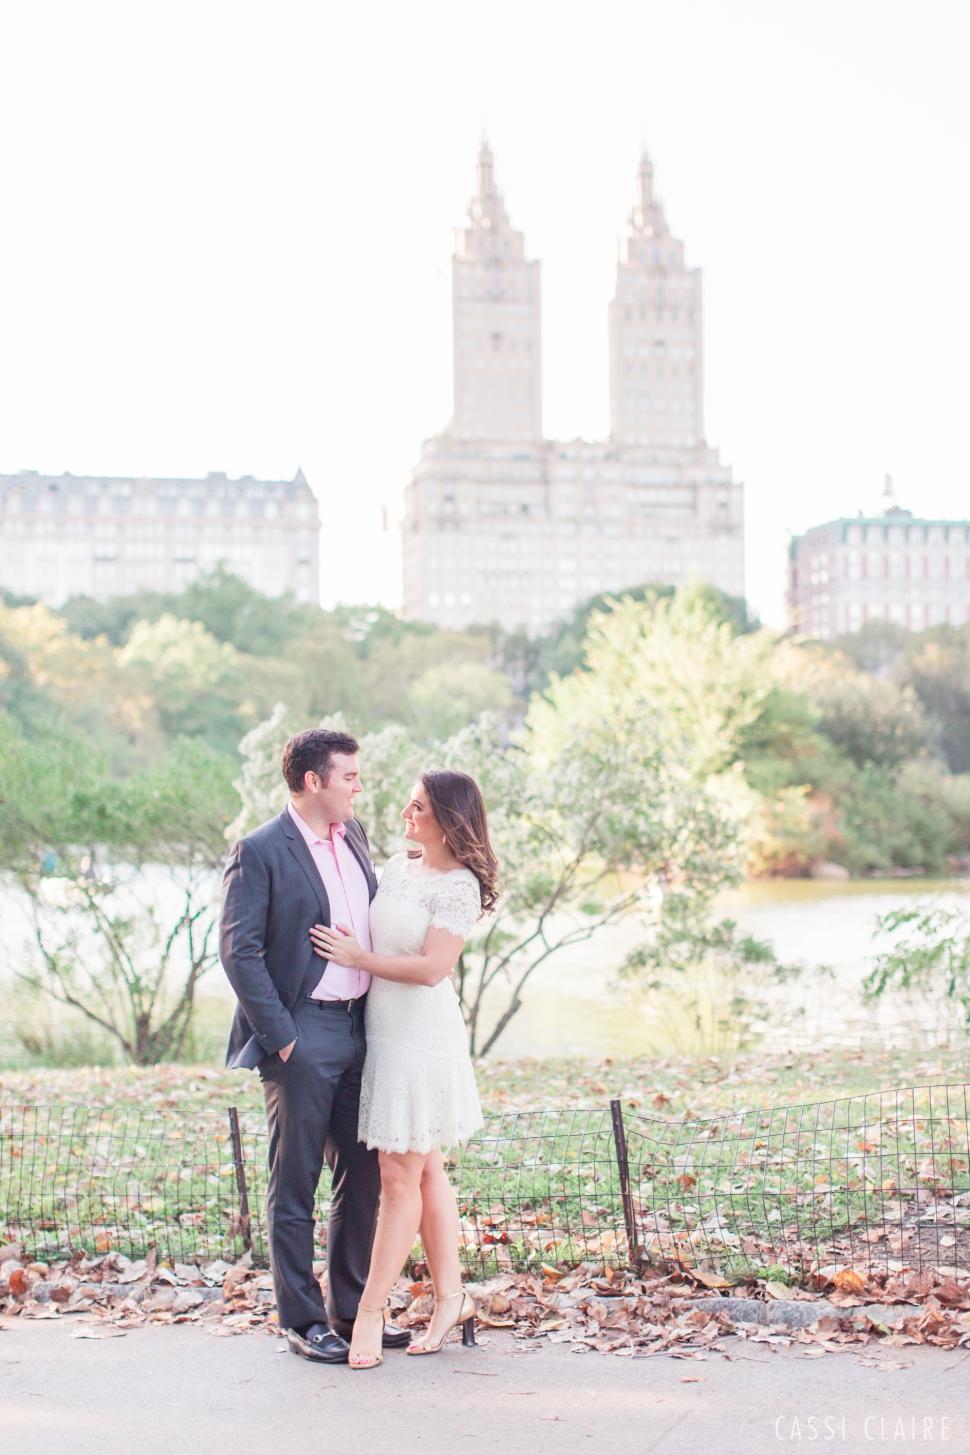 Central-Park-Engagement-Photos_01.jpg